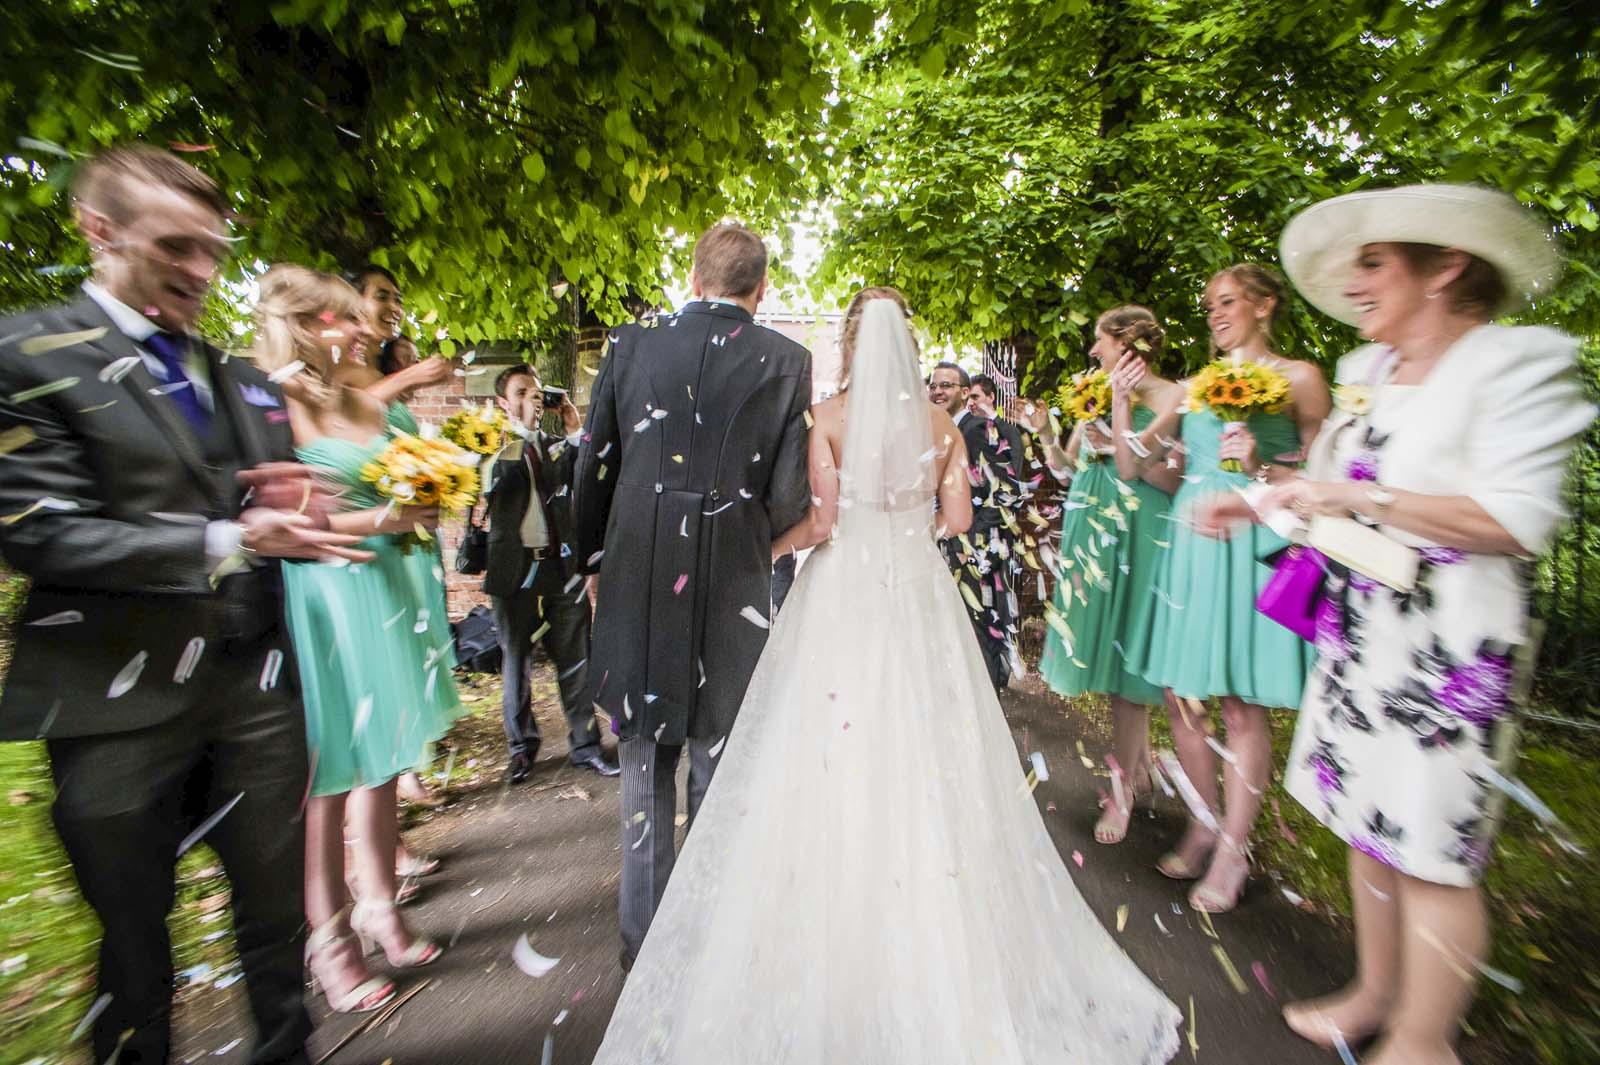 Laura Duncan by London Wedding Photographer Matthew Williams-Ellis